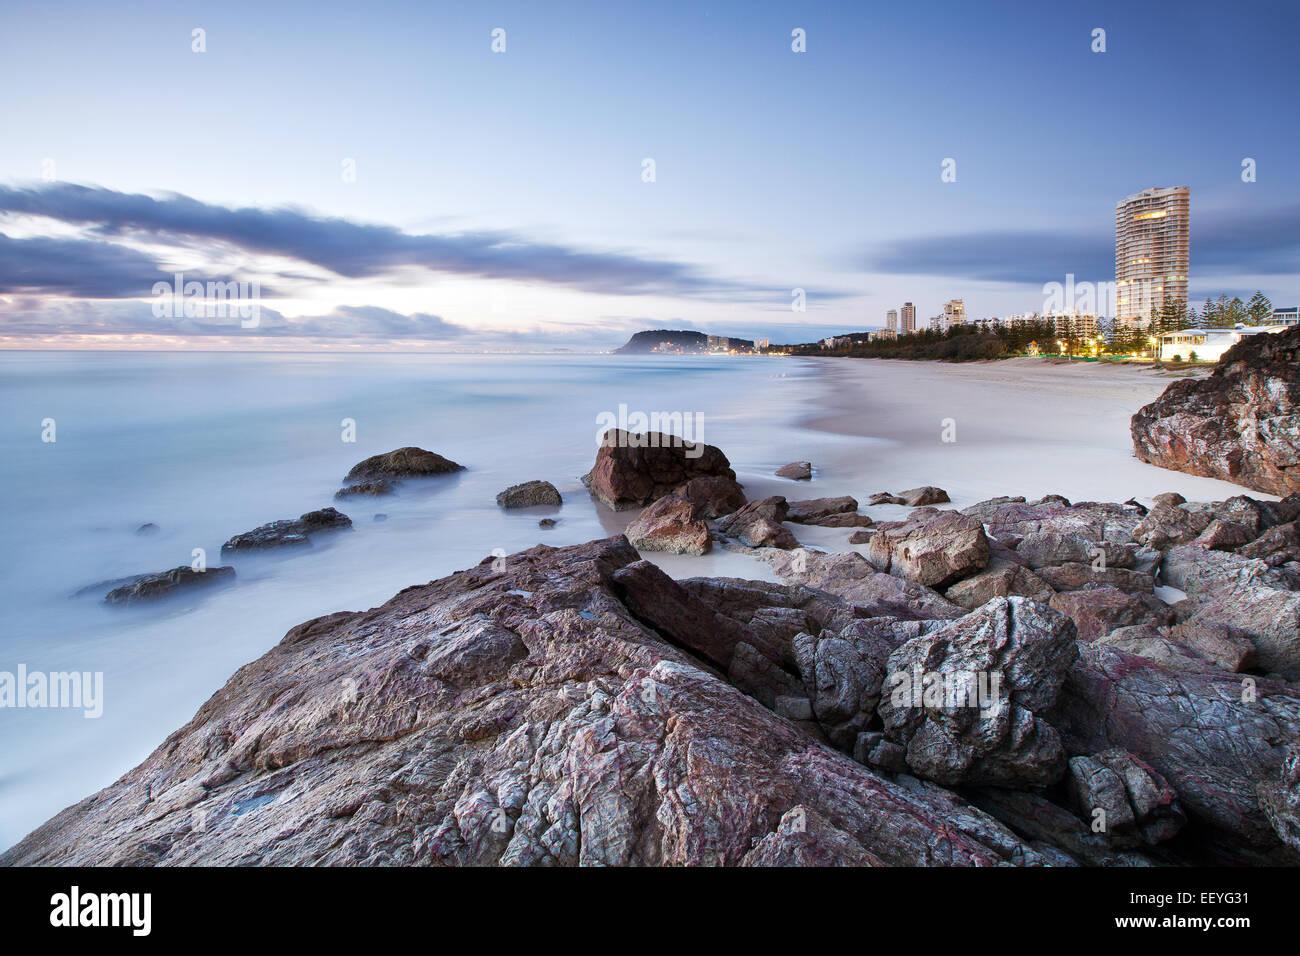 Escena costera australiana Imagen De Stock